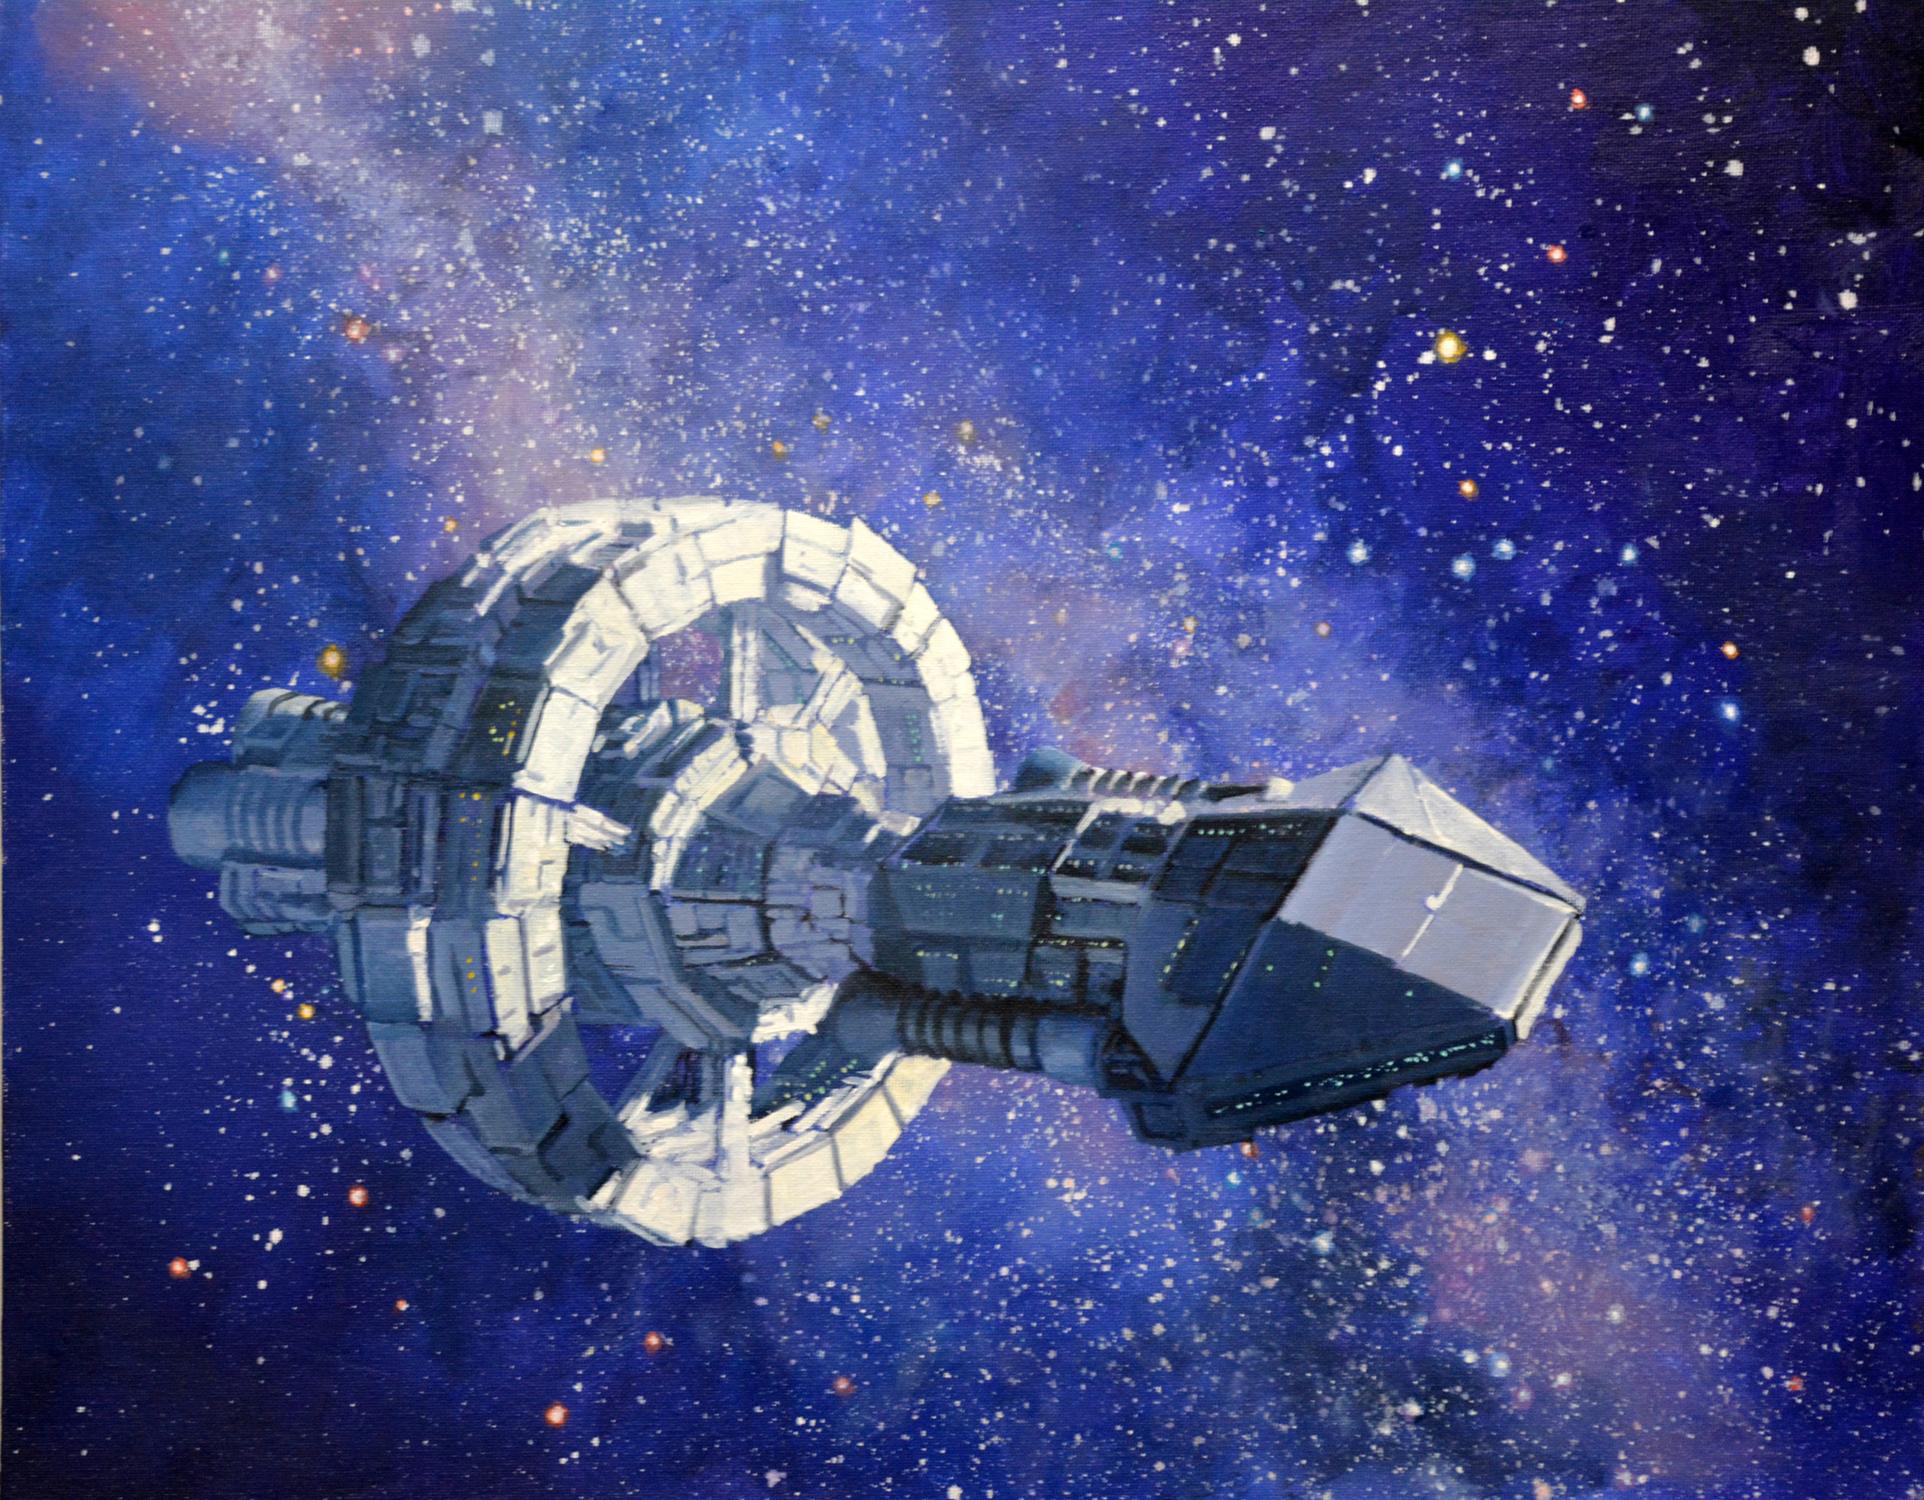 The River of Stars We Sail Artwork by Armand Cabrera